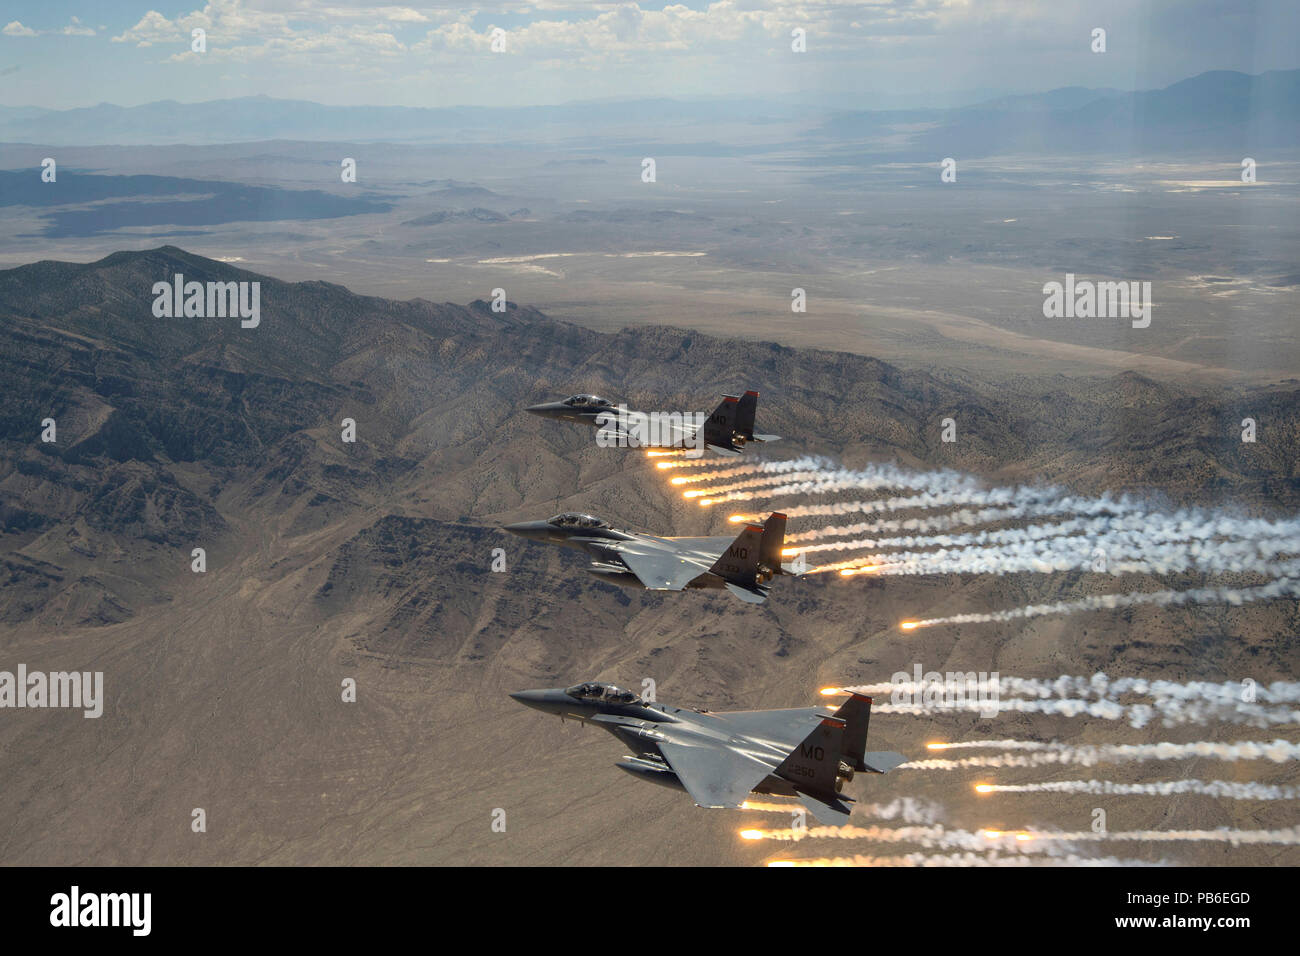 Three U.S. Air Force F-15E Strike Eagles fire flares - Stock Image